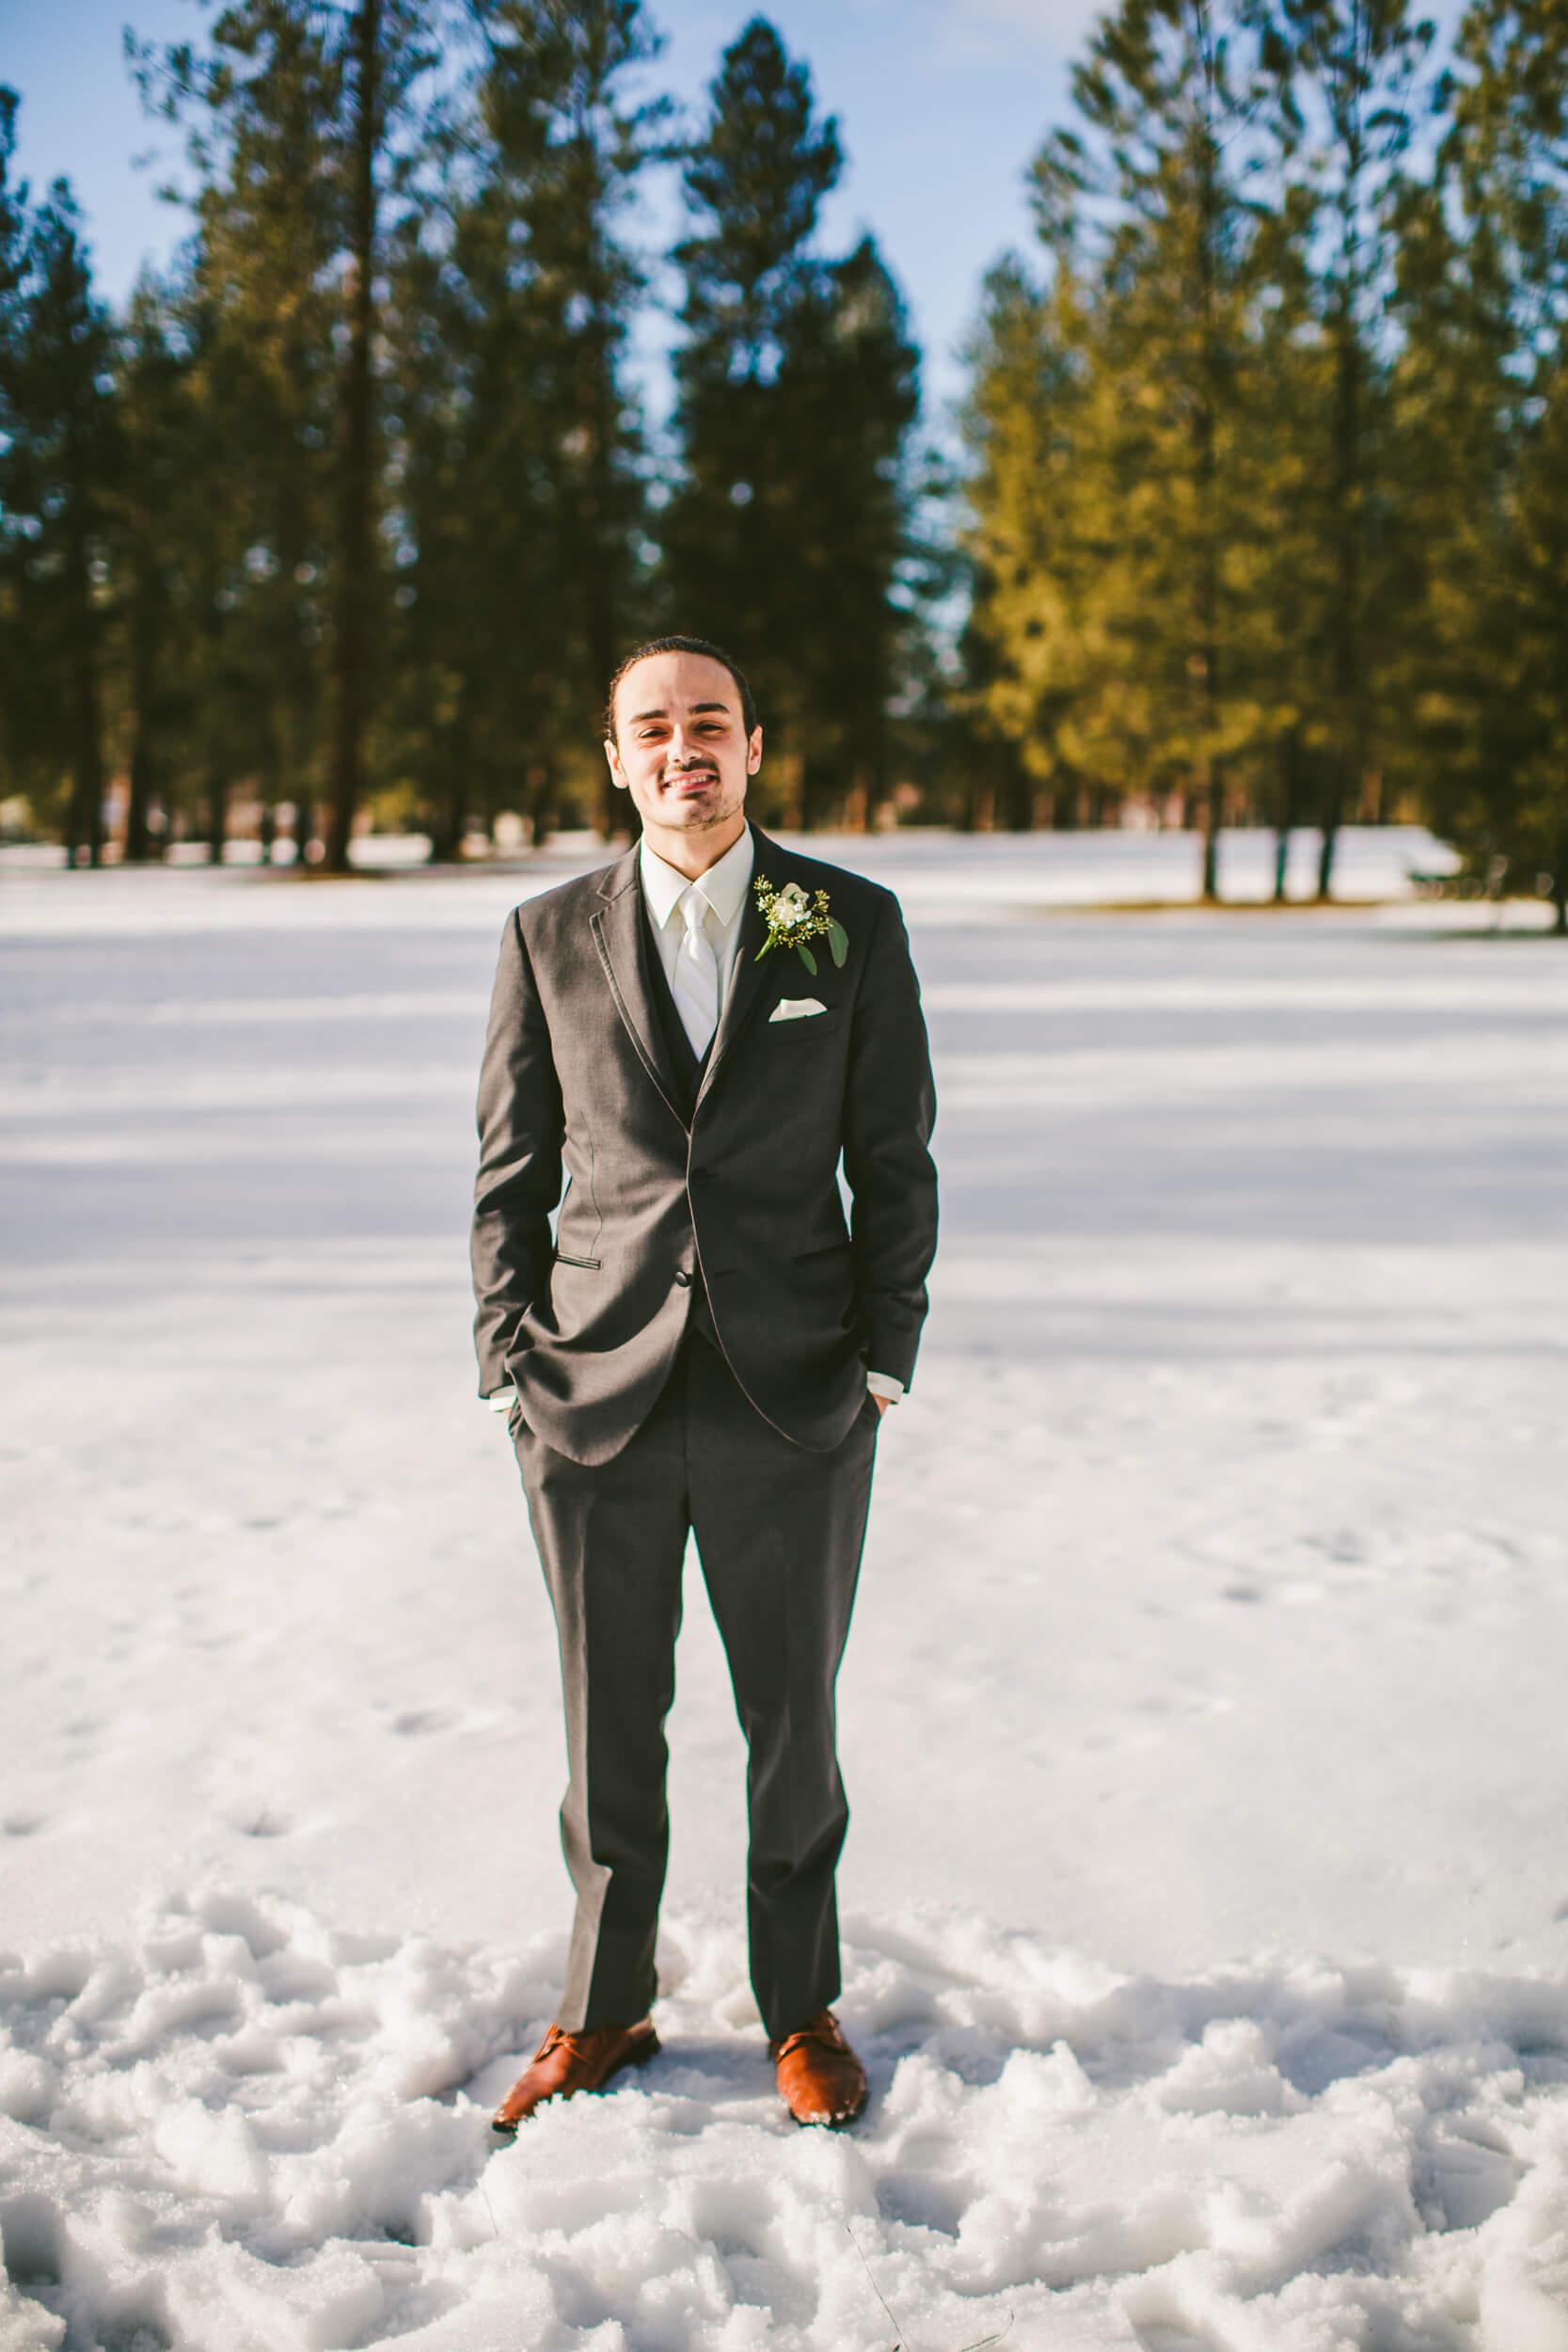 mukogawa winter wedding in spokane (121).jpg